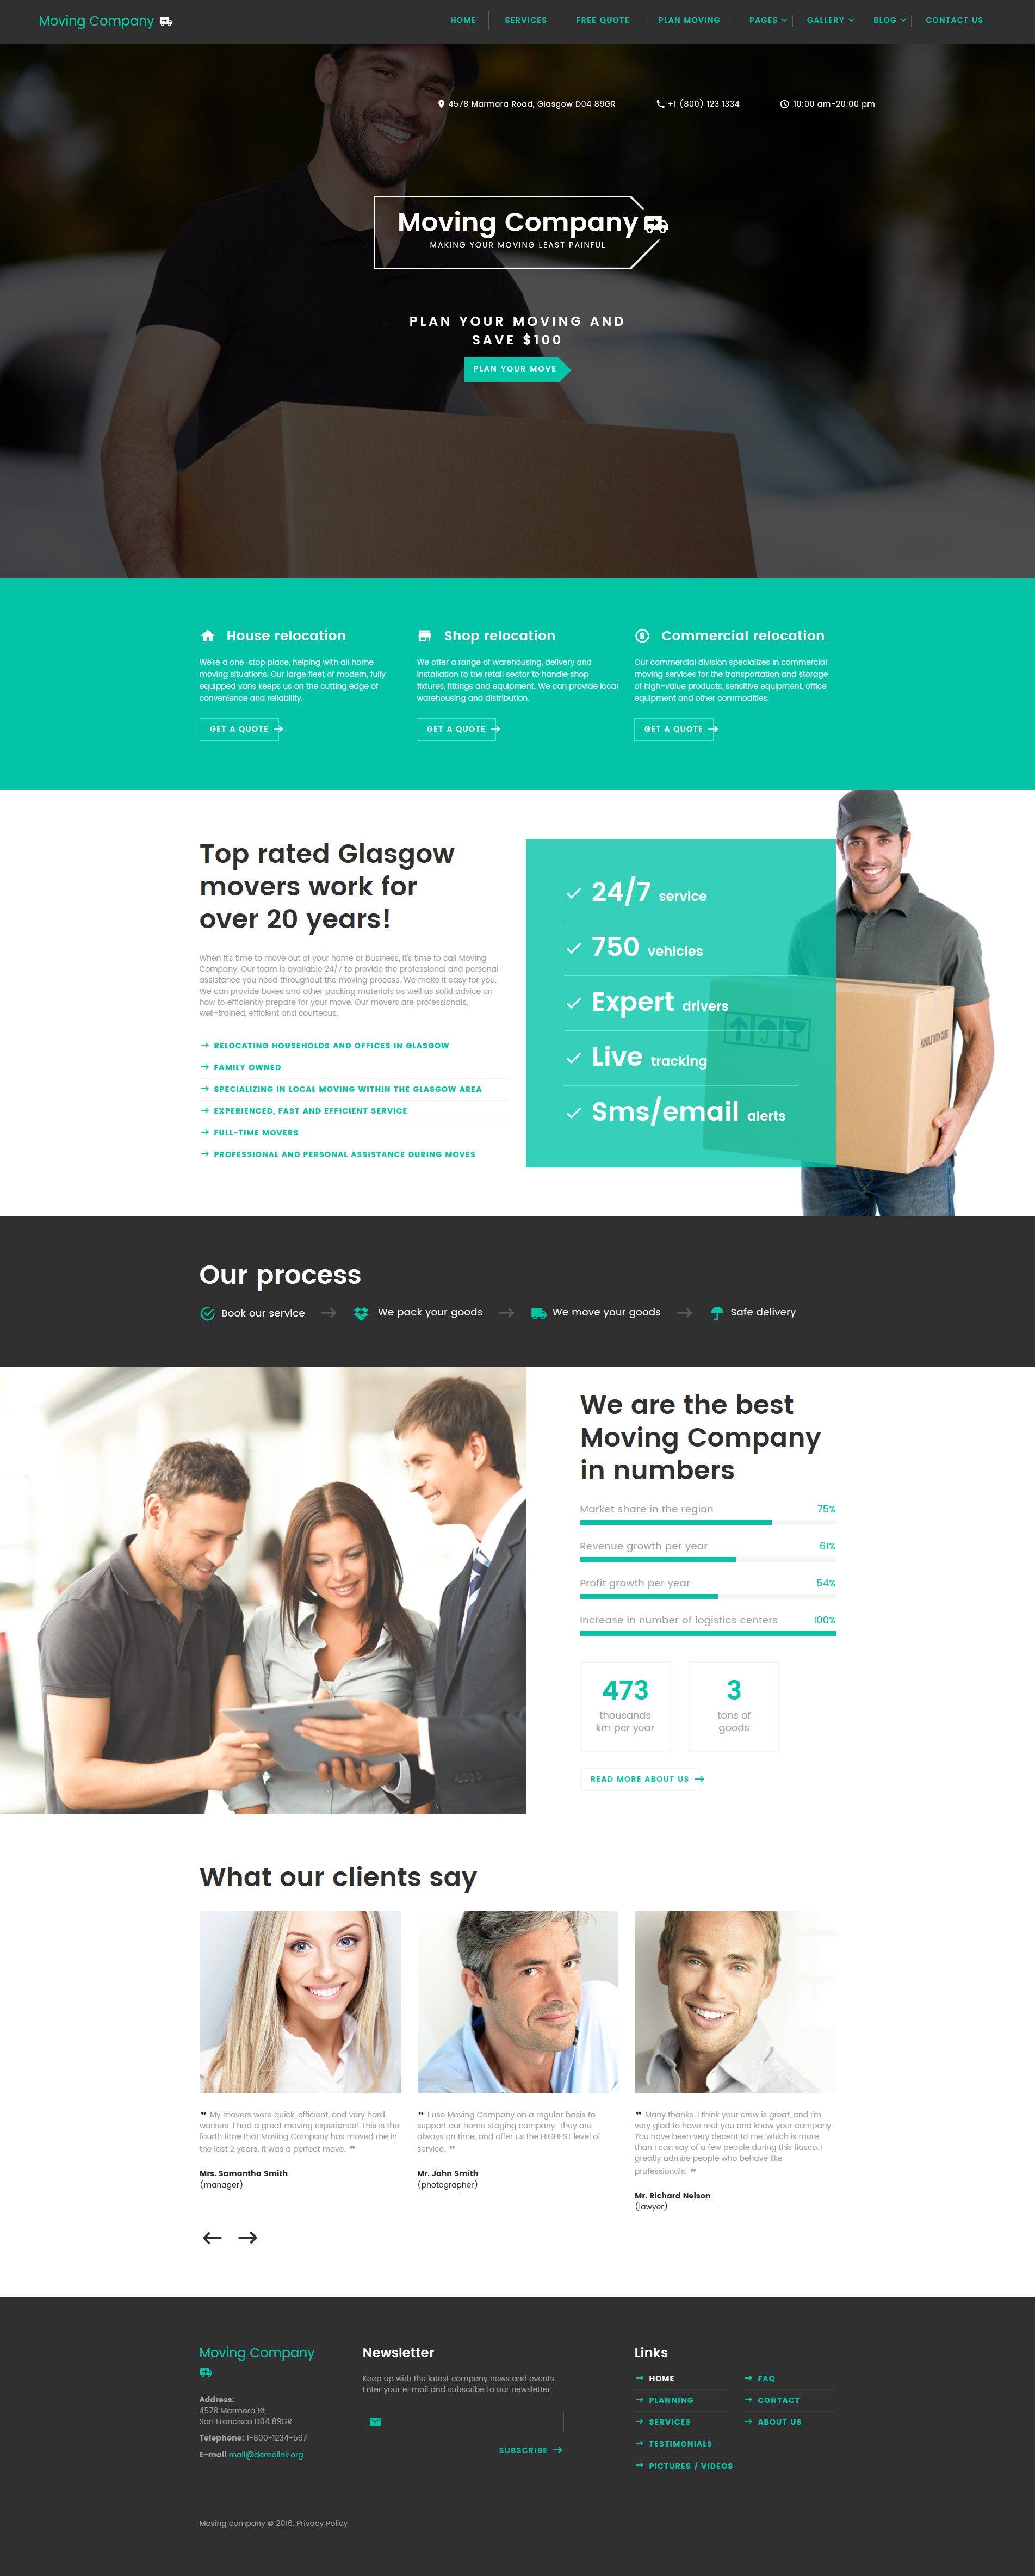 Moving Company Responsive Website Template - screenshot